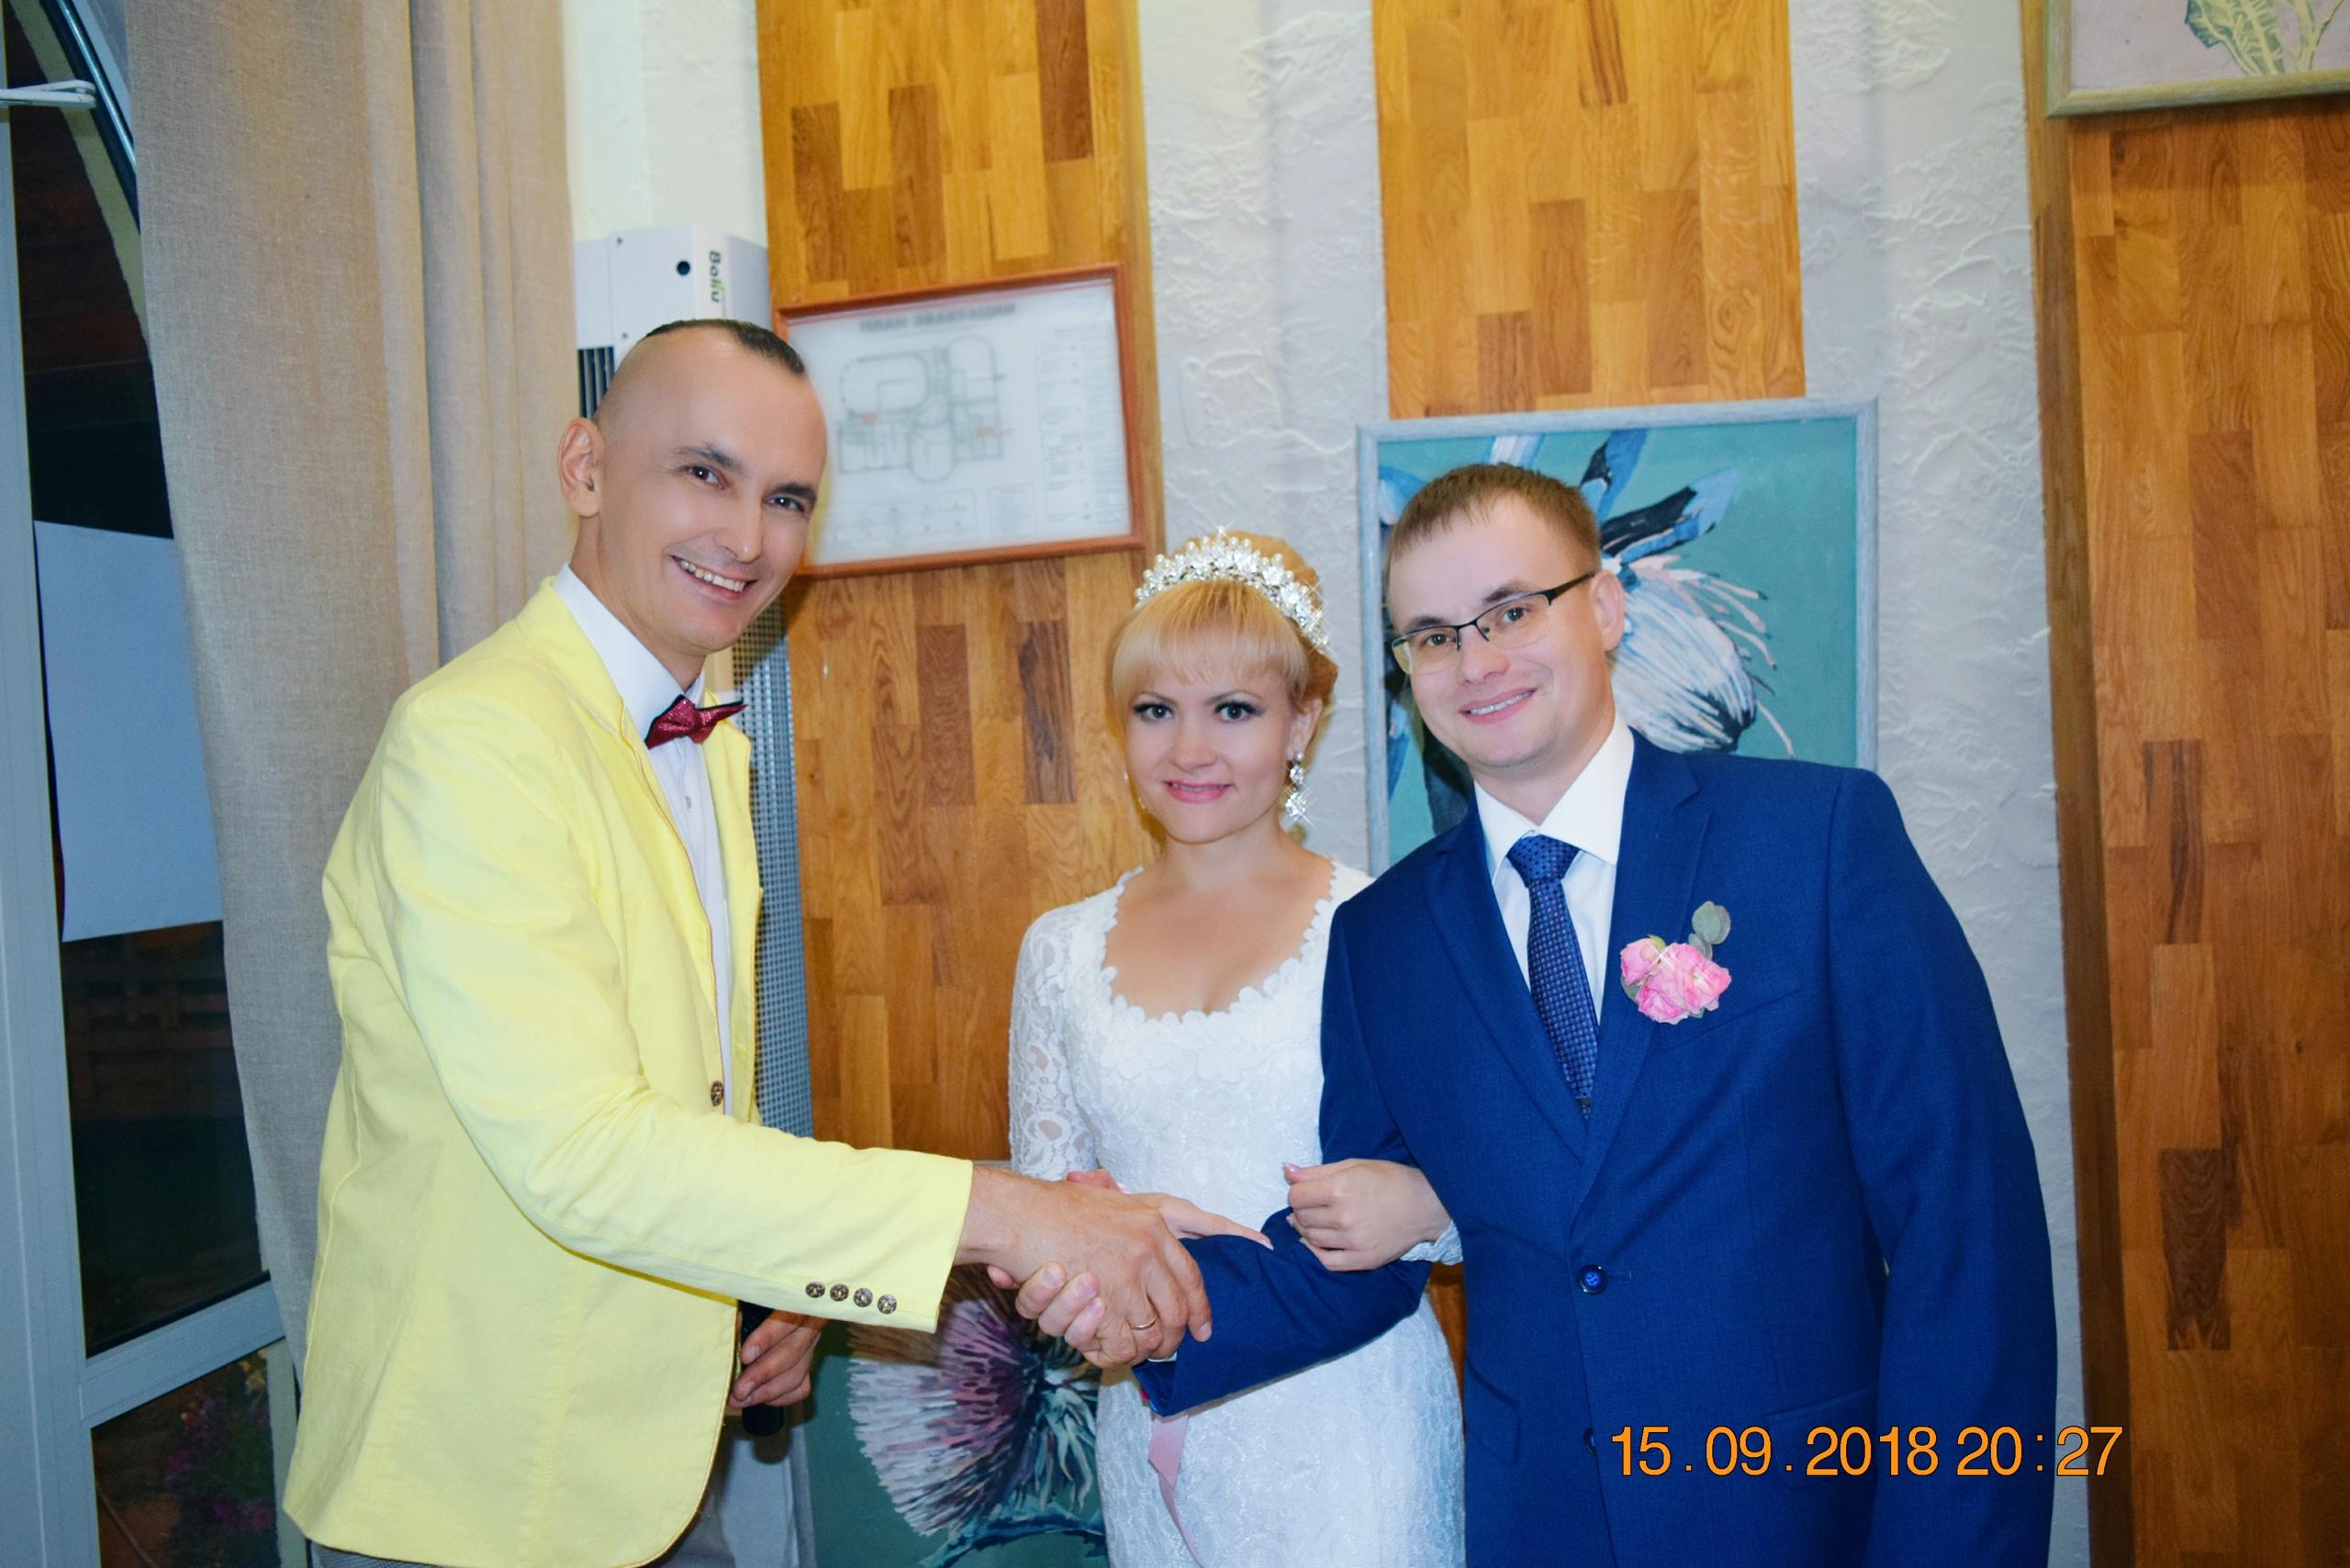 62p7 9ol5h8 - Свадьба Александра и Марии